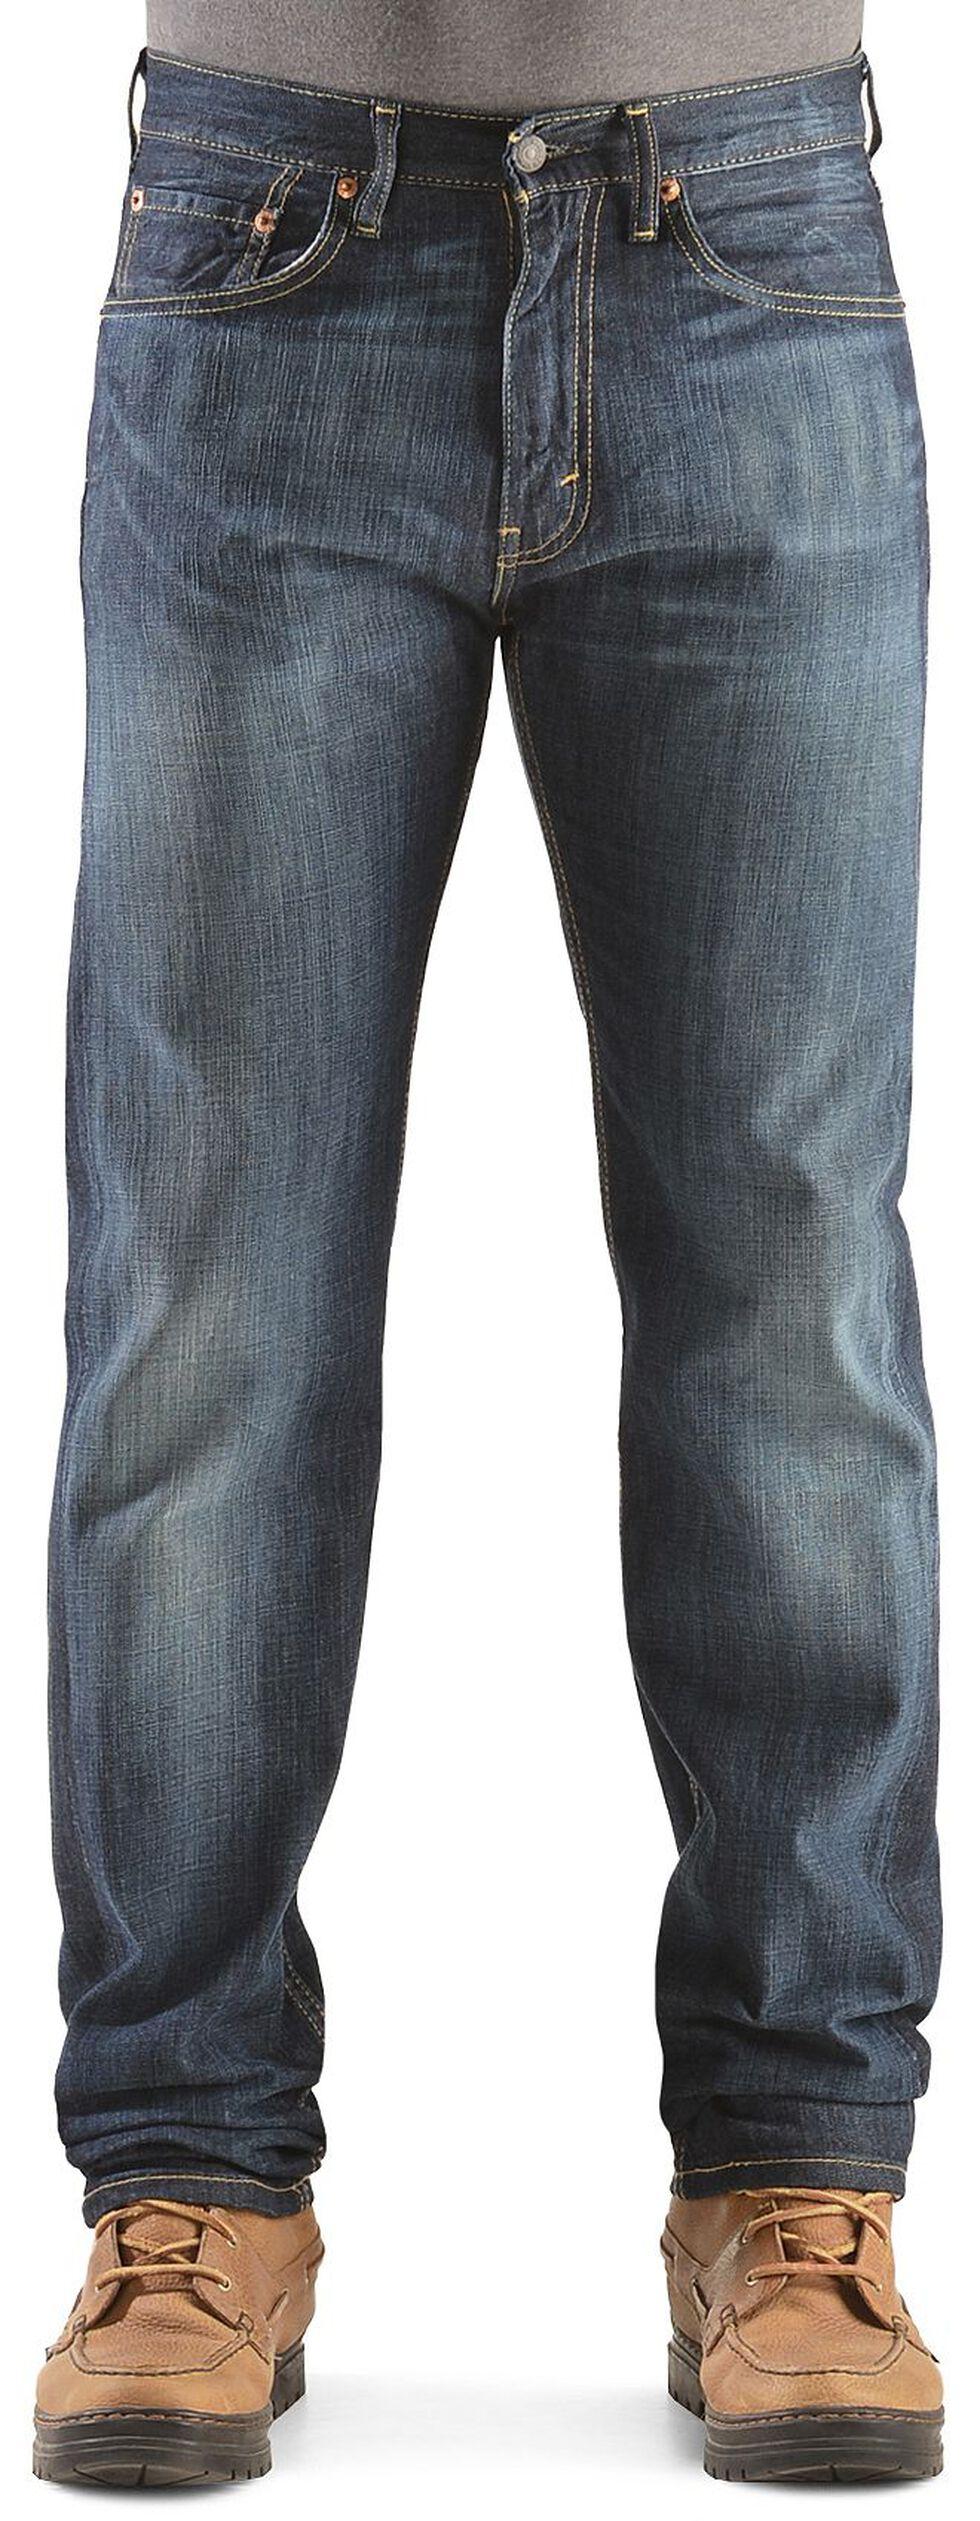 Levi's 505 Shoestring Rinse Straight Leg Jeans, Dark Denim, hi-res